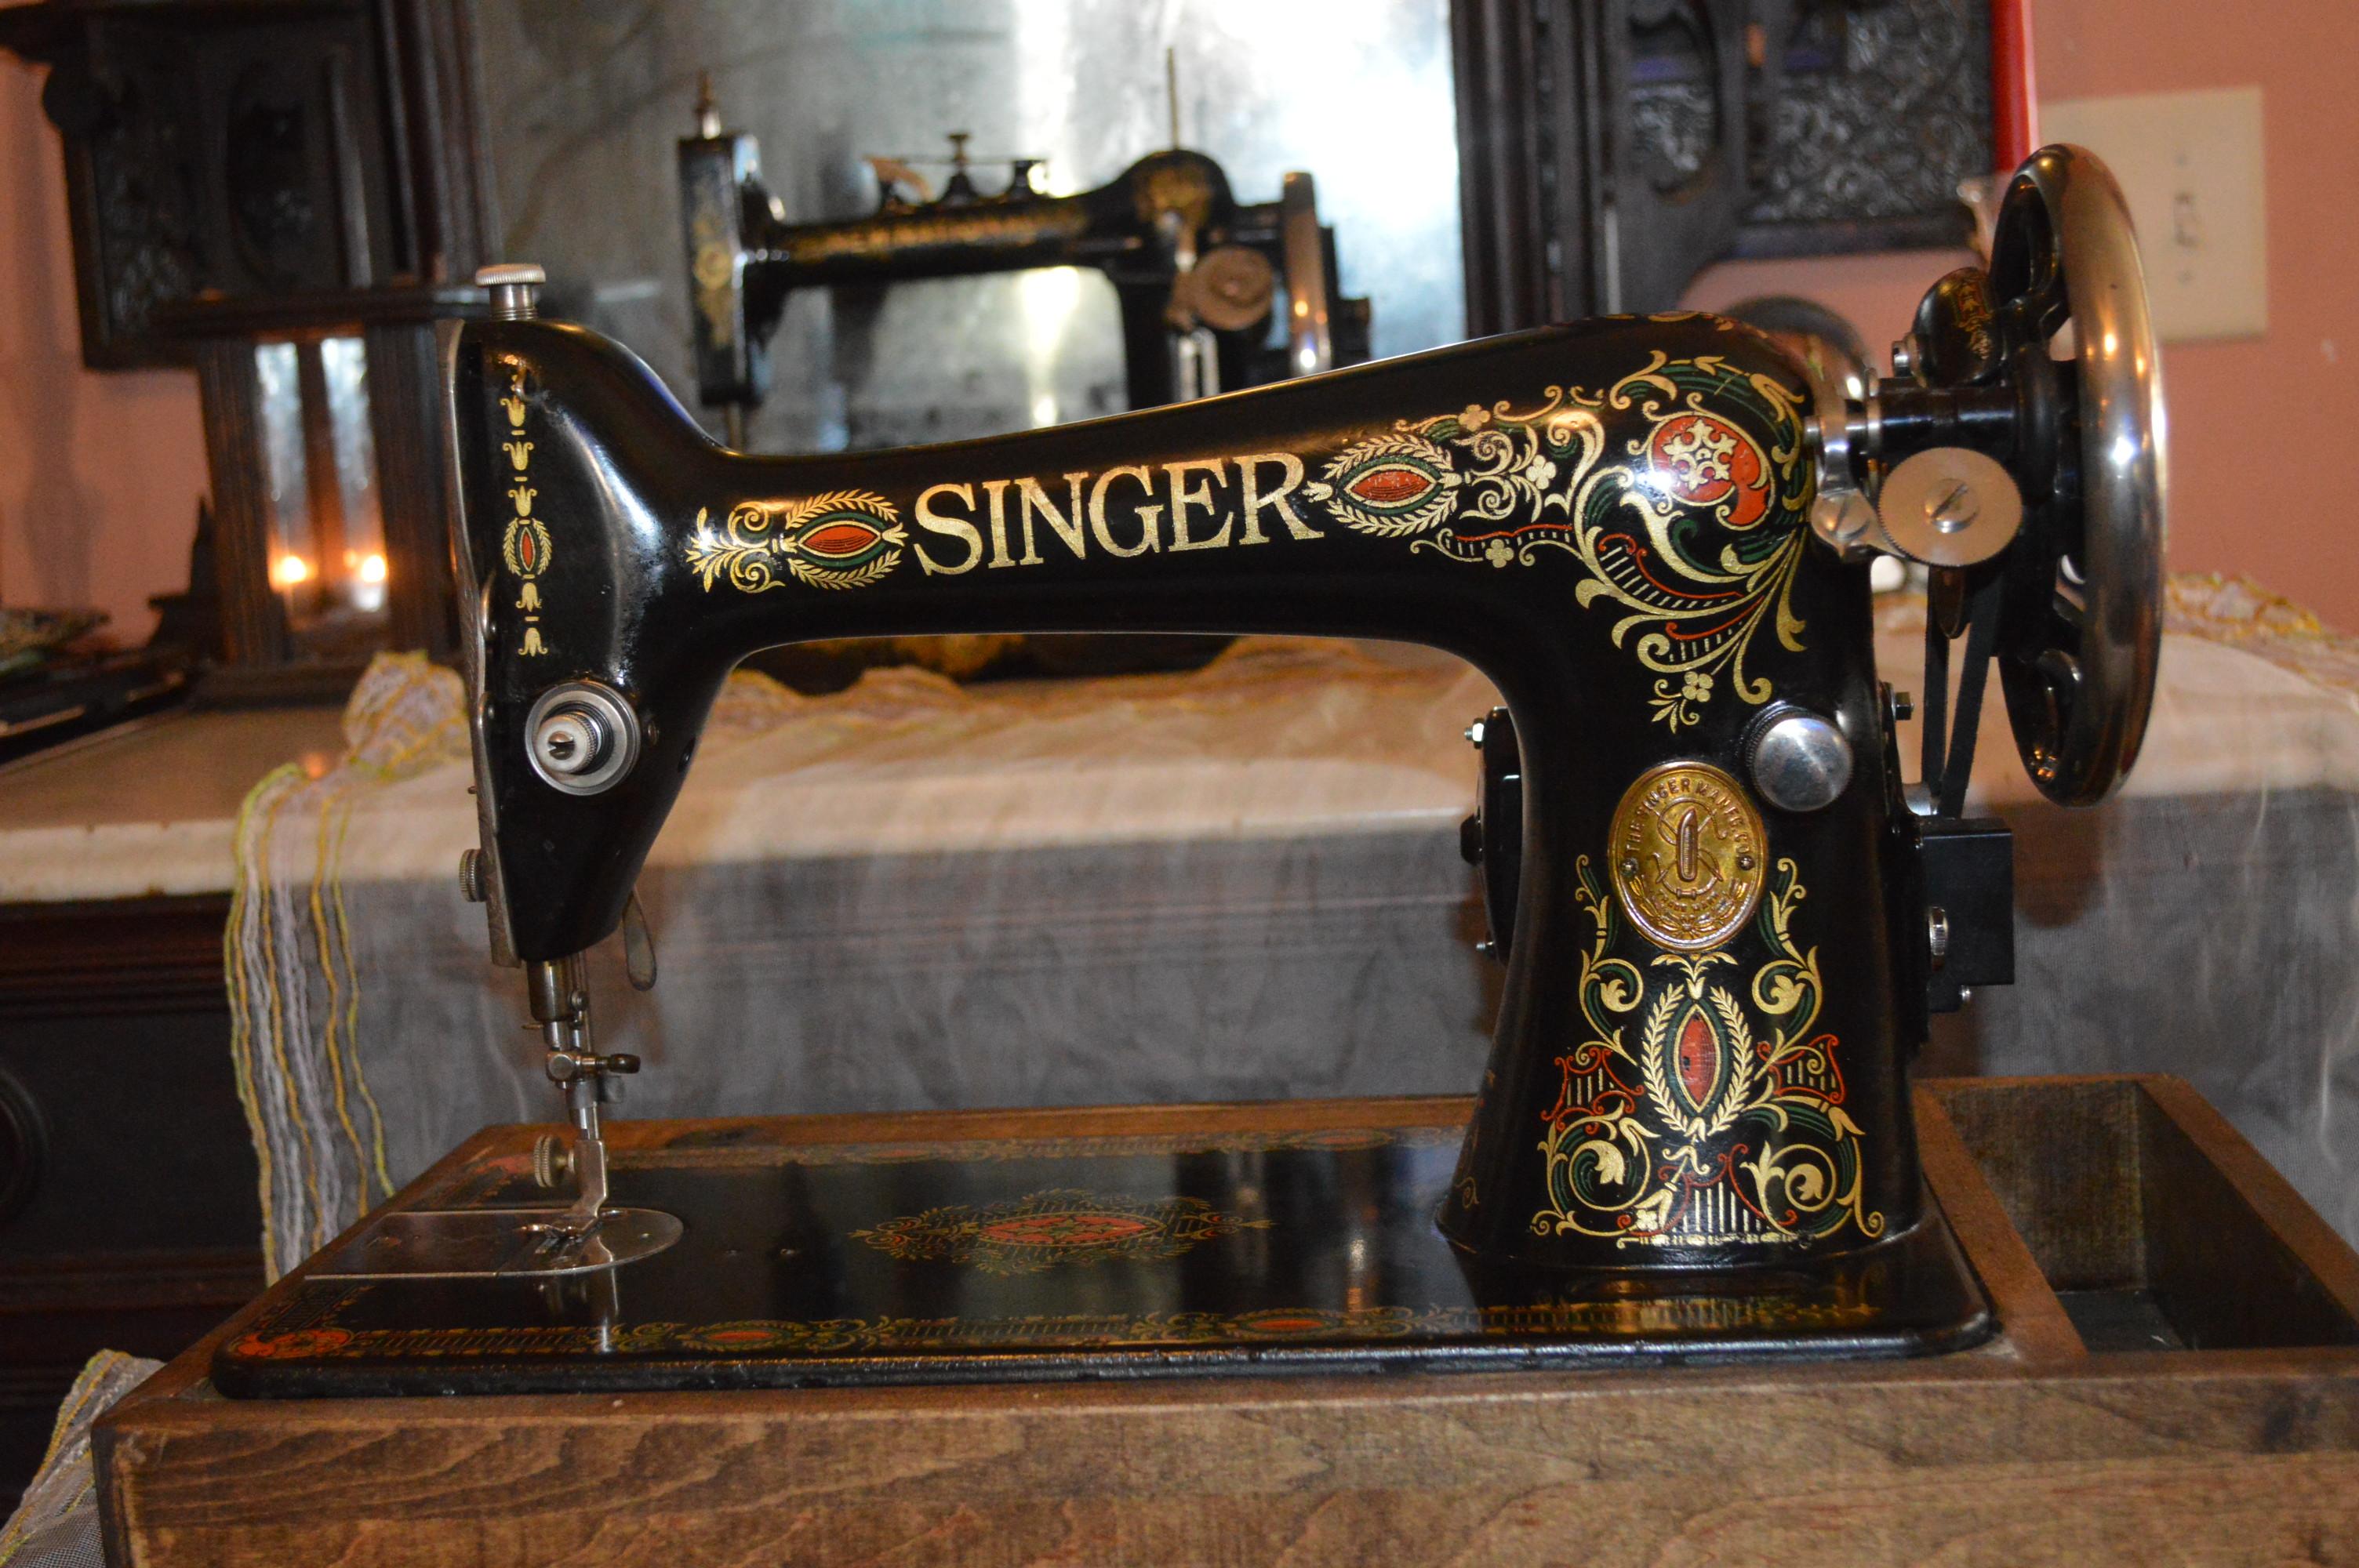 Commercial Sewing Machine Restoration Decals Full Set Singer Model 31